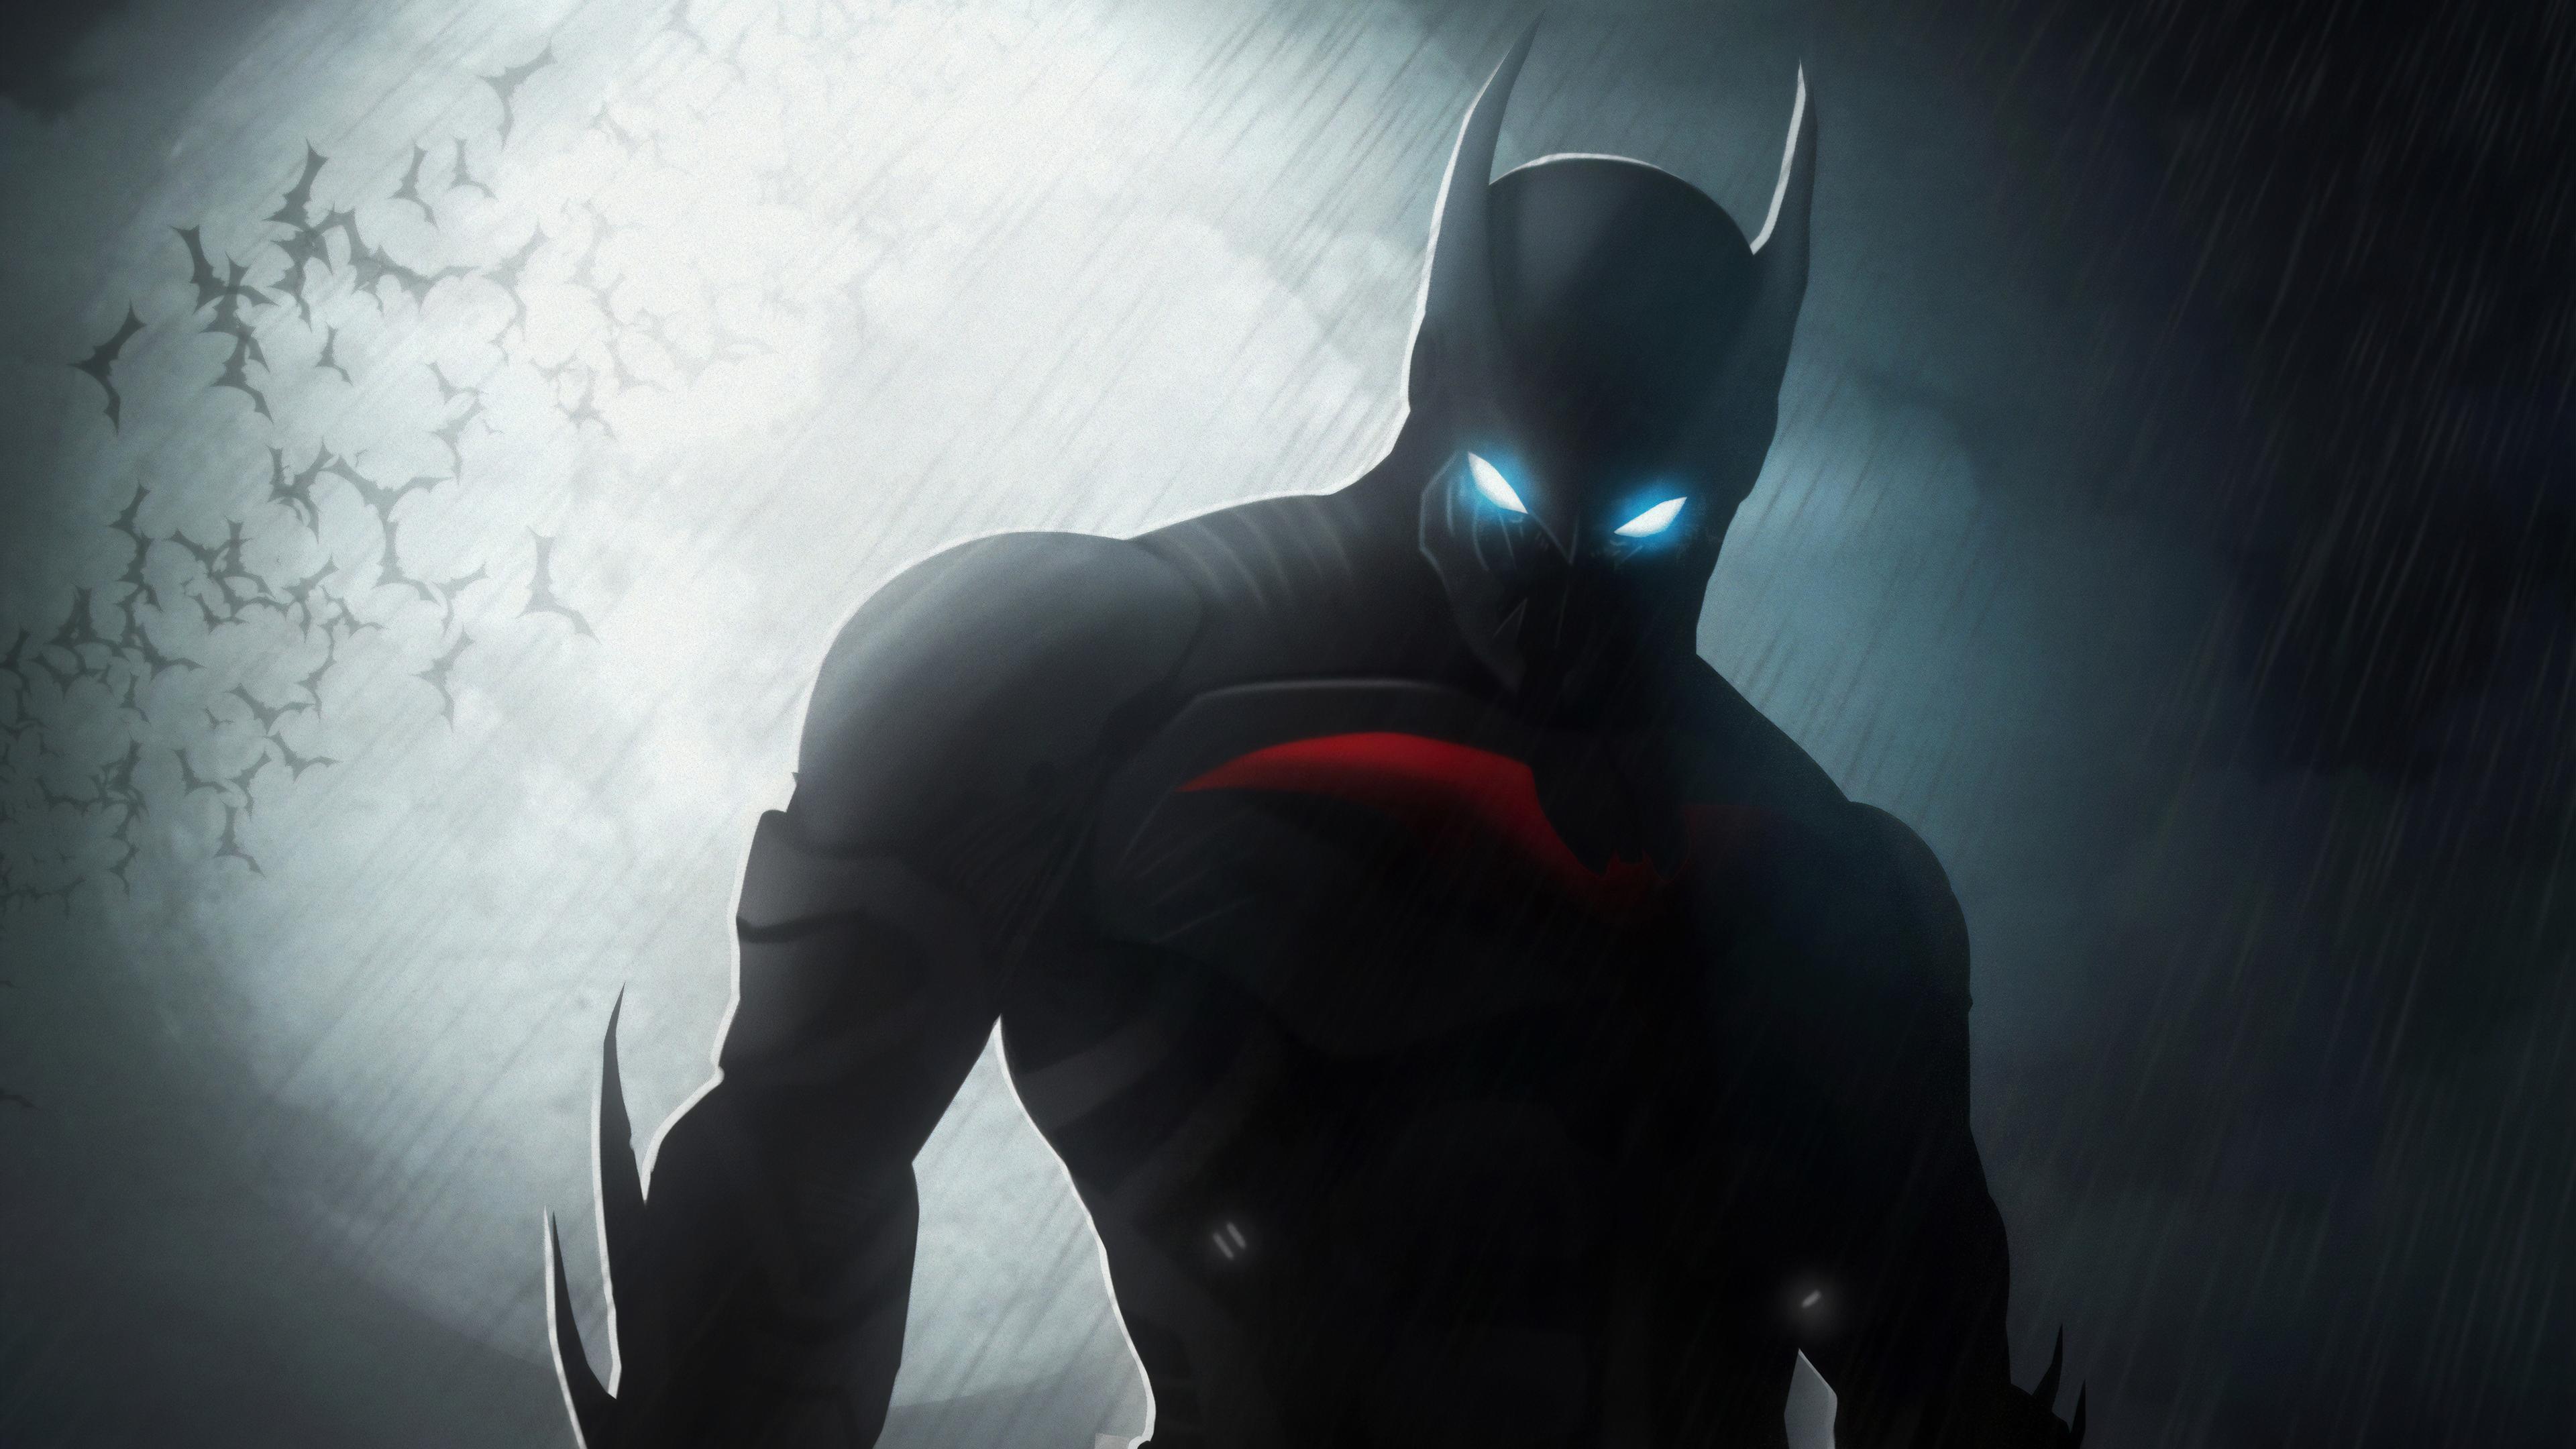 batman beyond art 1565053262 - Batman Beyond Art - superheroes wallpapers, hd-wallpapers, digital art wallpapers, deviantart wallpapers, batman wallpapers, batman beyond wallpapers, artwork wallpapers, 4k-wallpapers